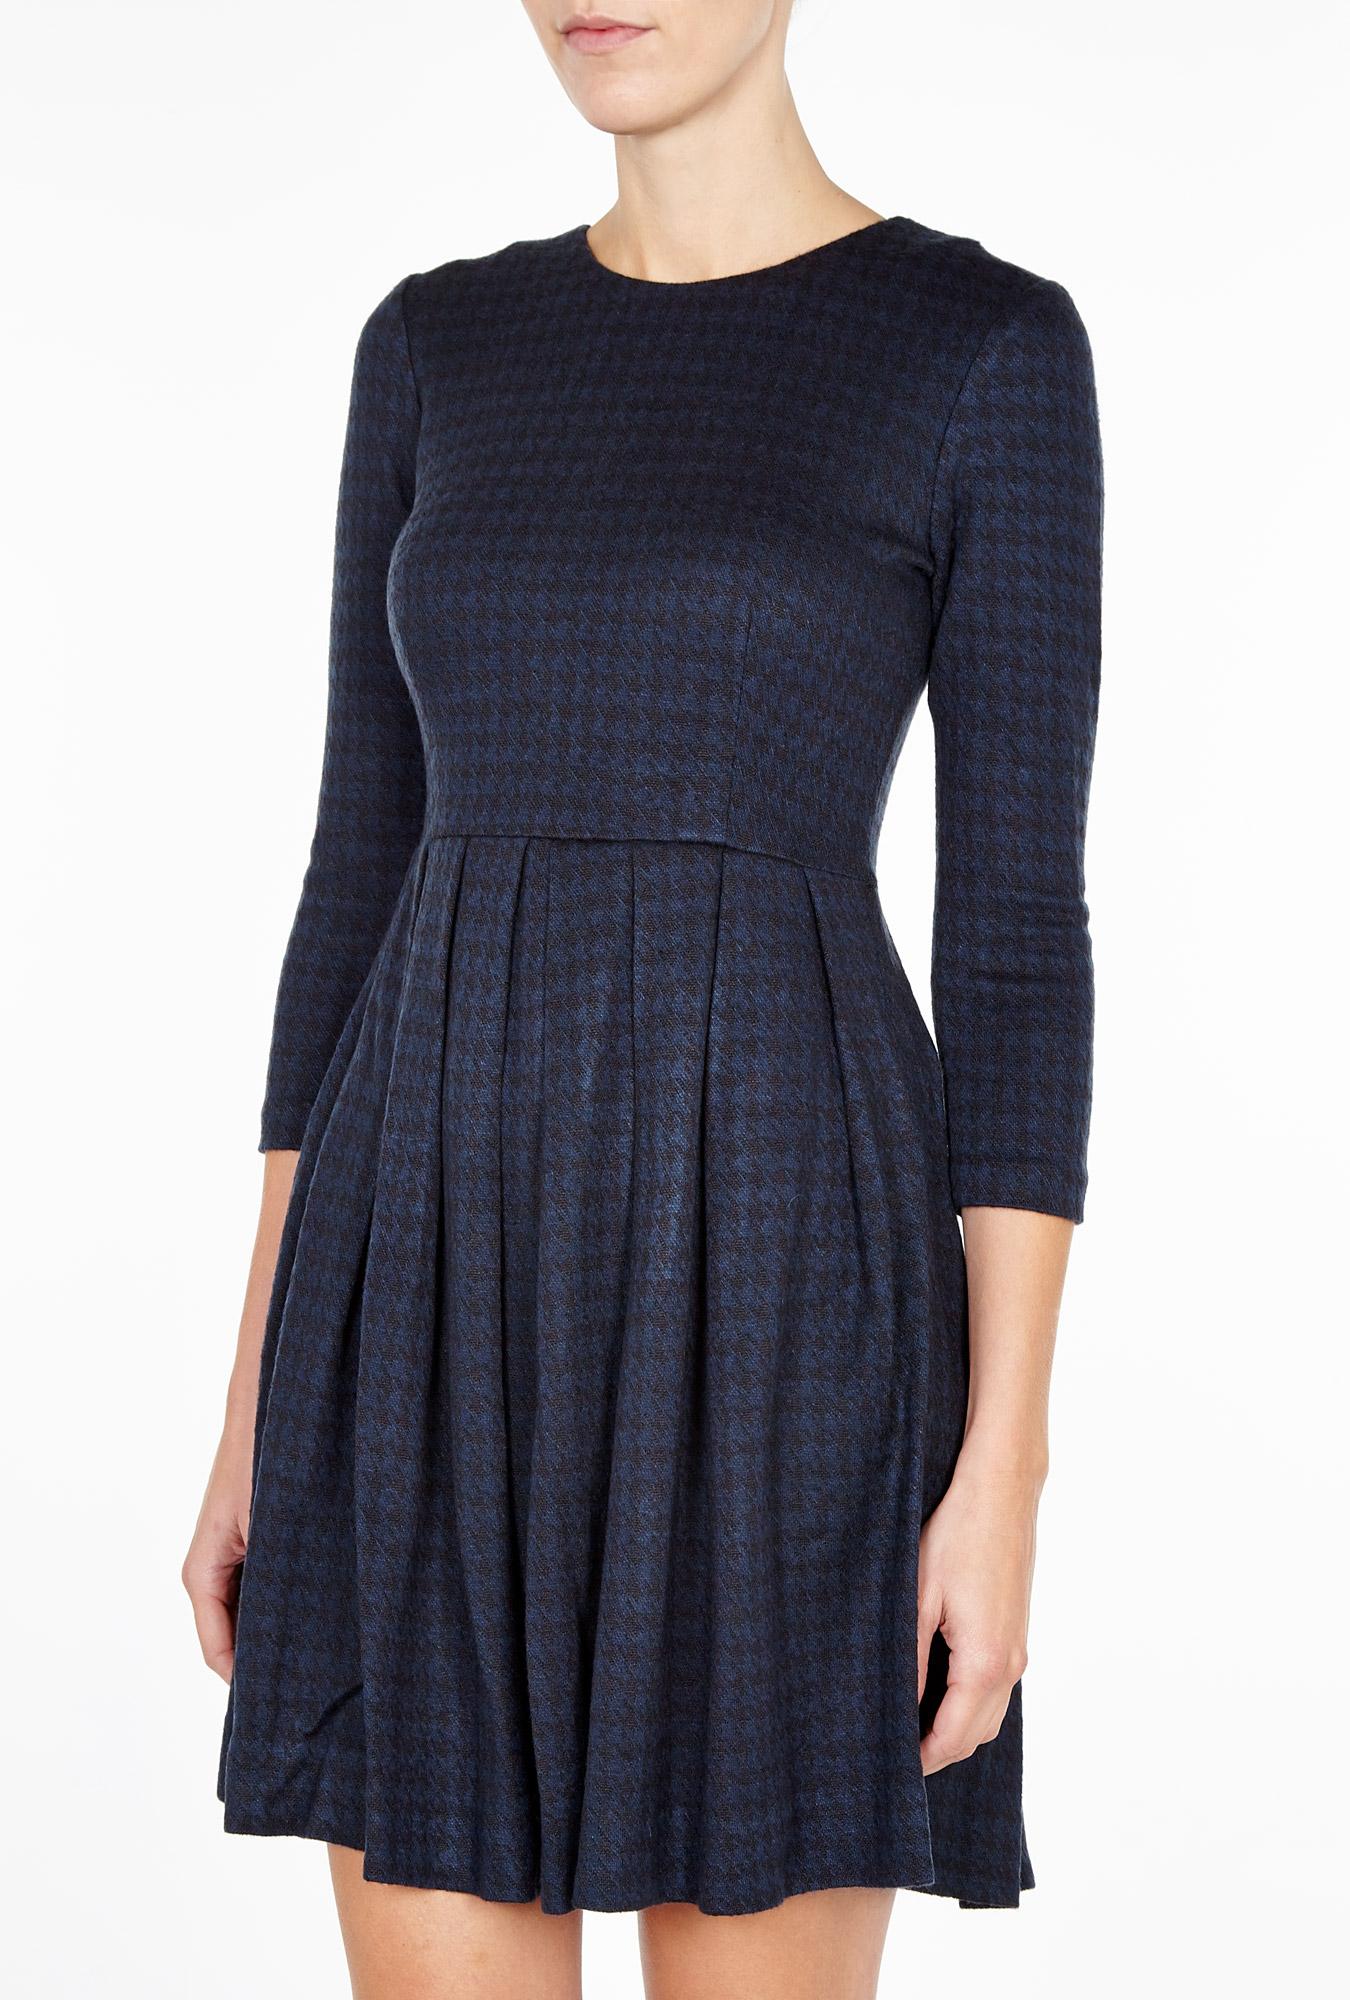 Ganni elasticated waist dress, was £170, now £102